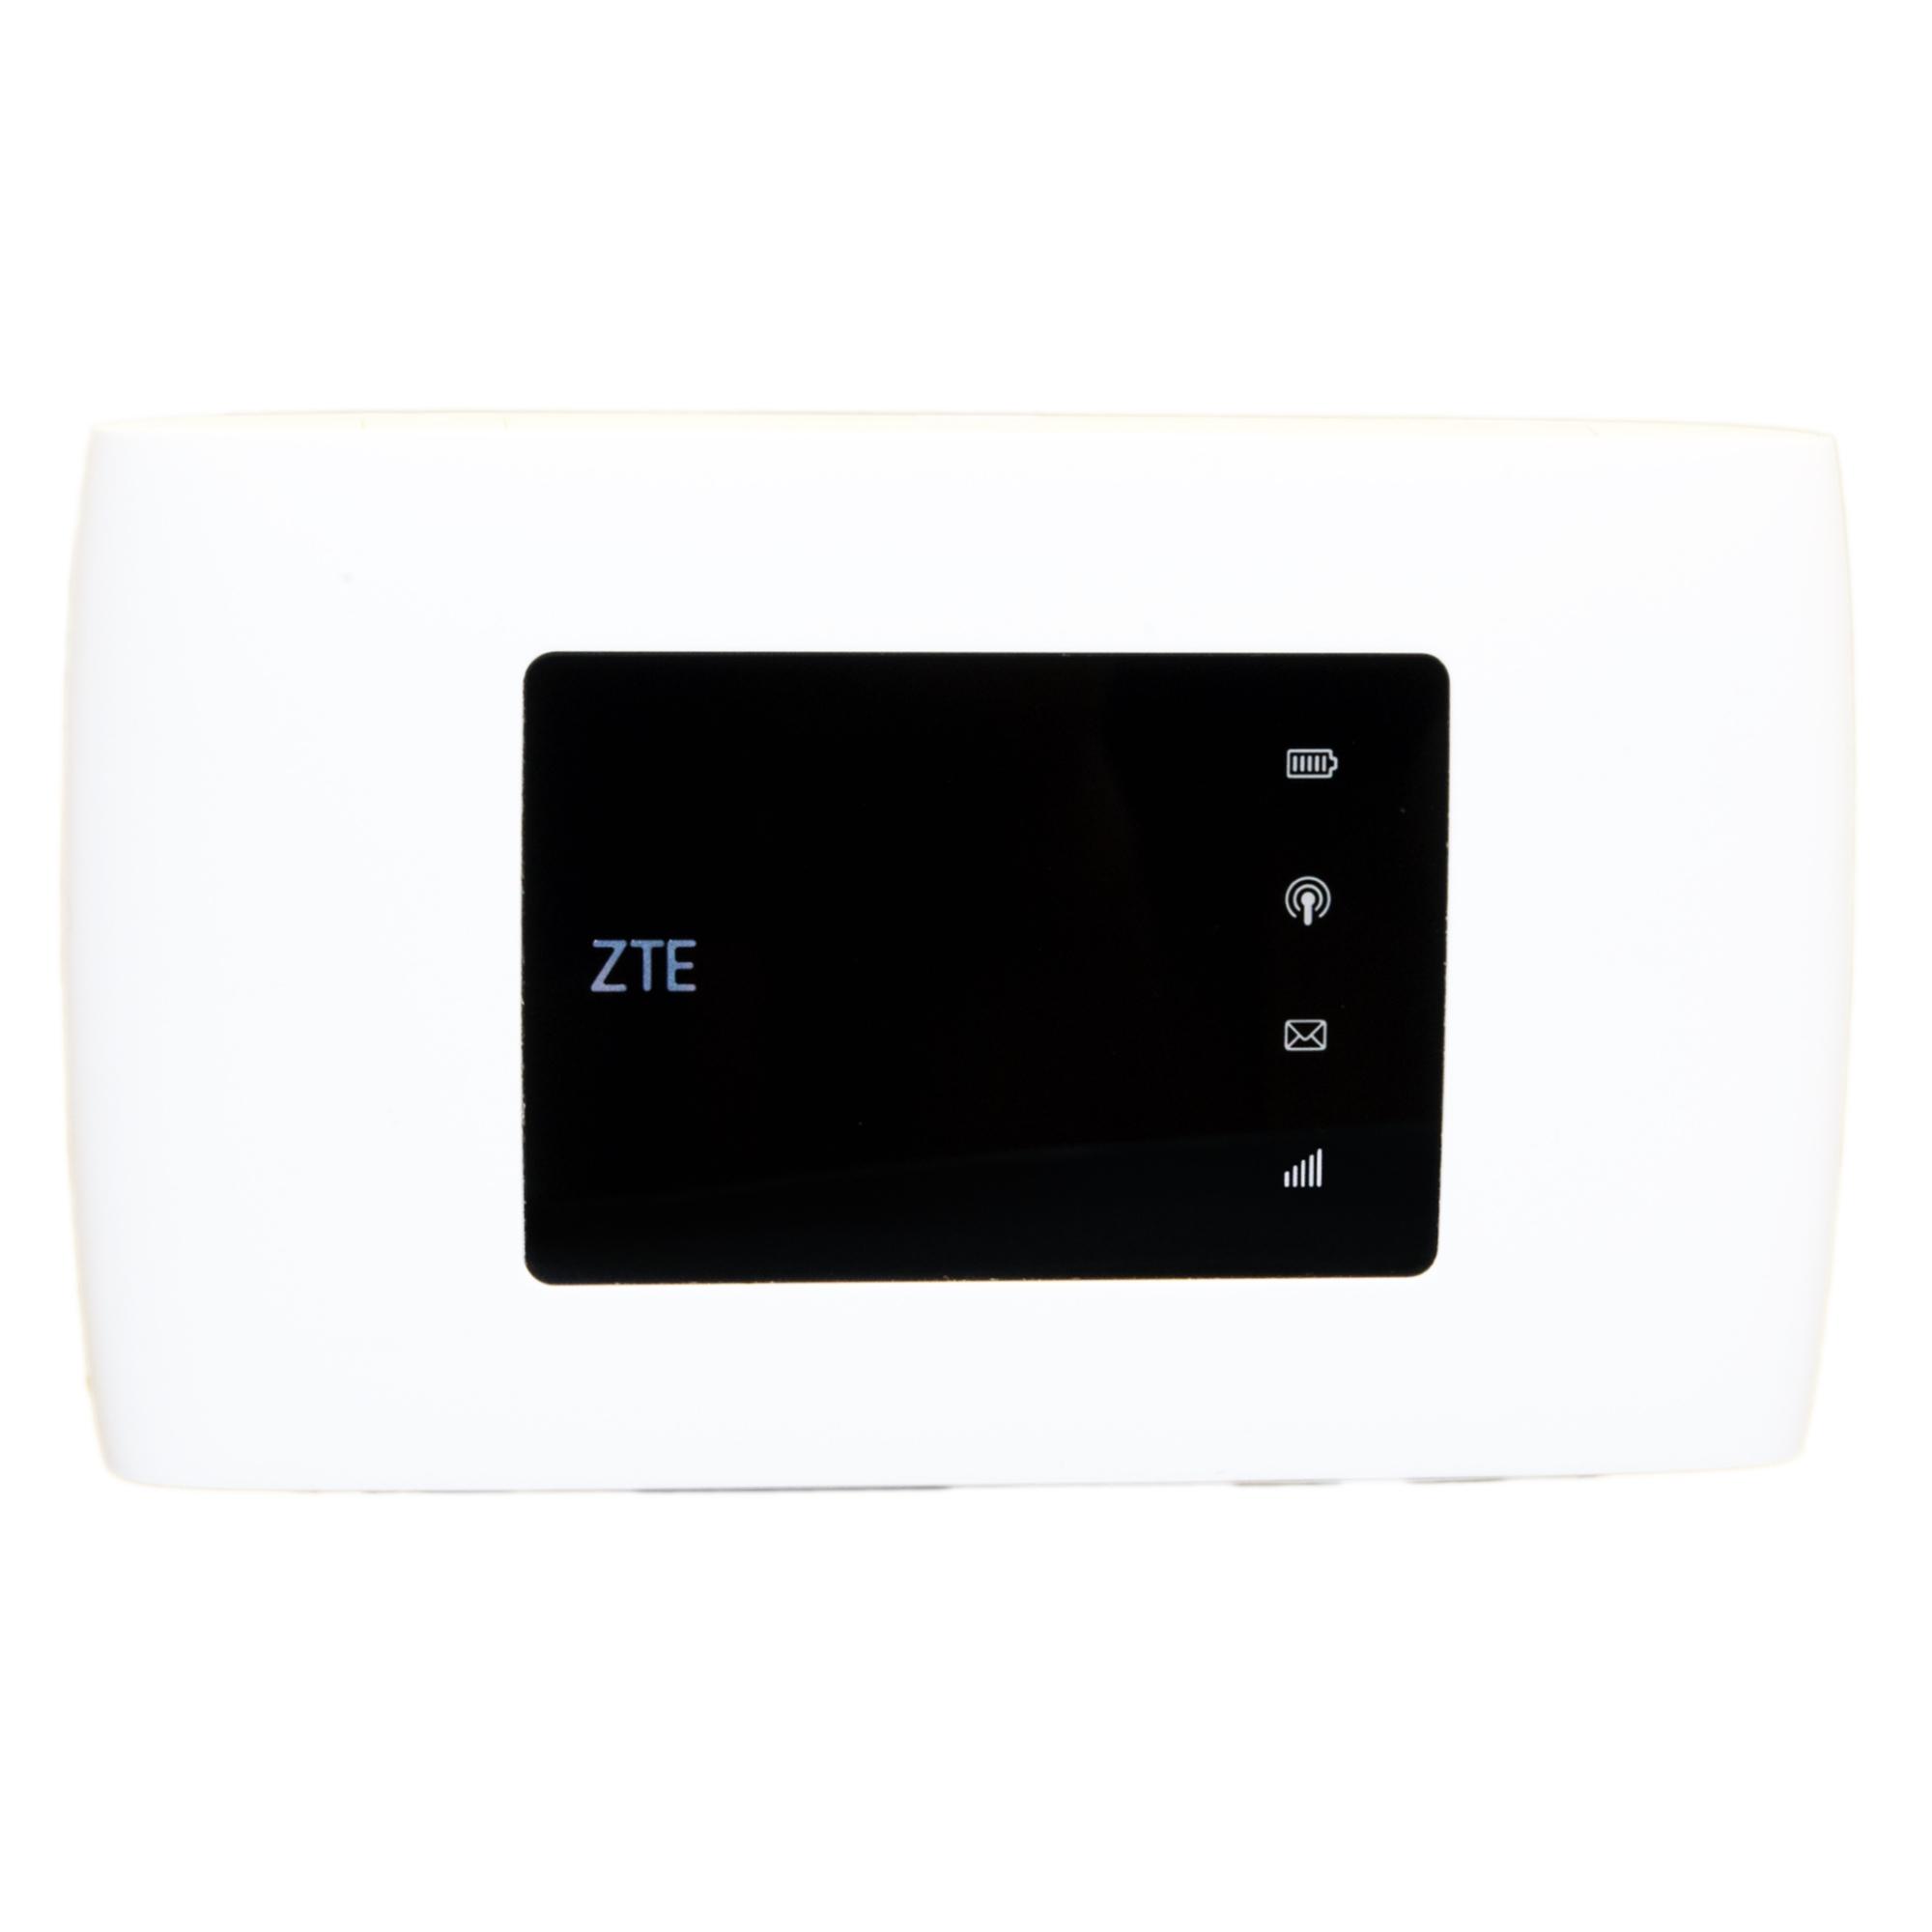 Top 12 2 4 Ghz Wifi Hotspot - Gorgeous Tiny